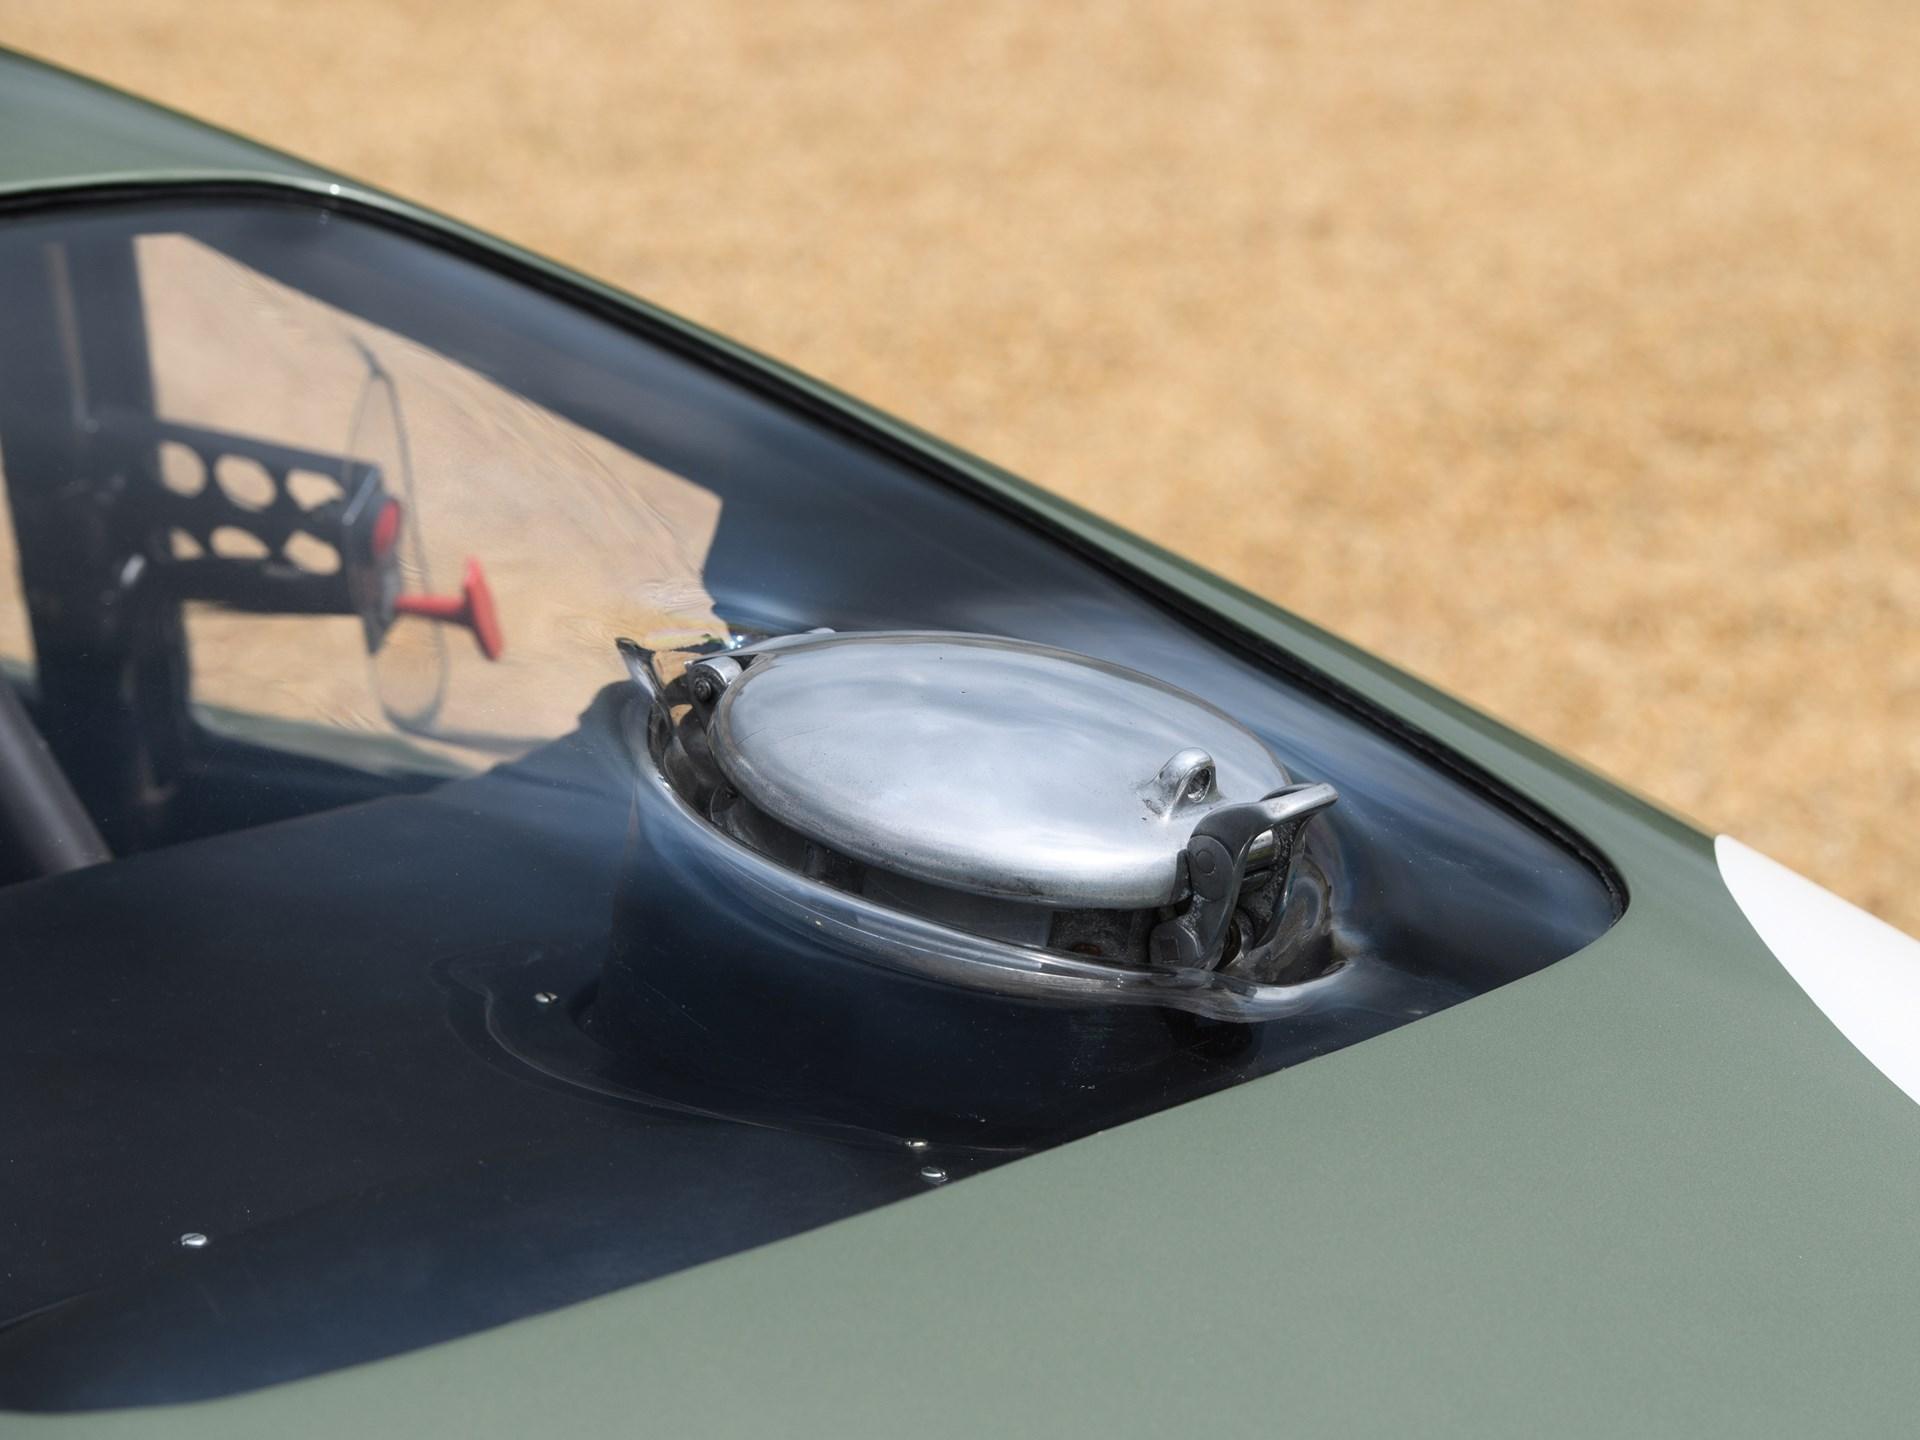 1963 Aston Martin DP215 Grand Touring Competition Prototype